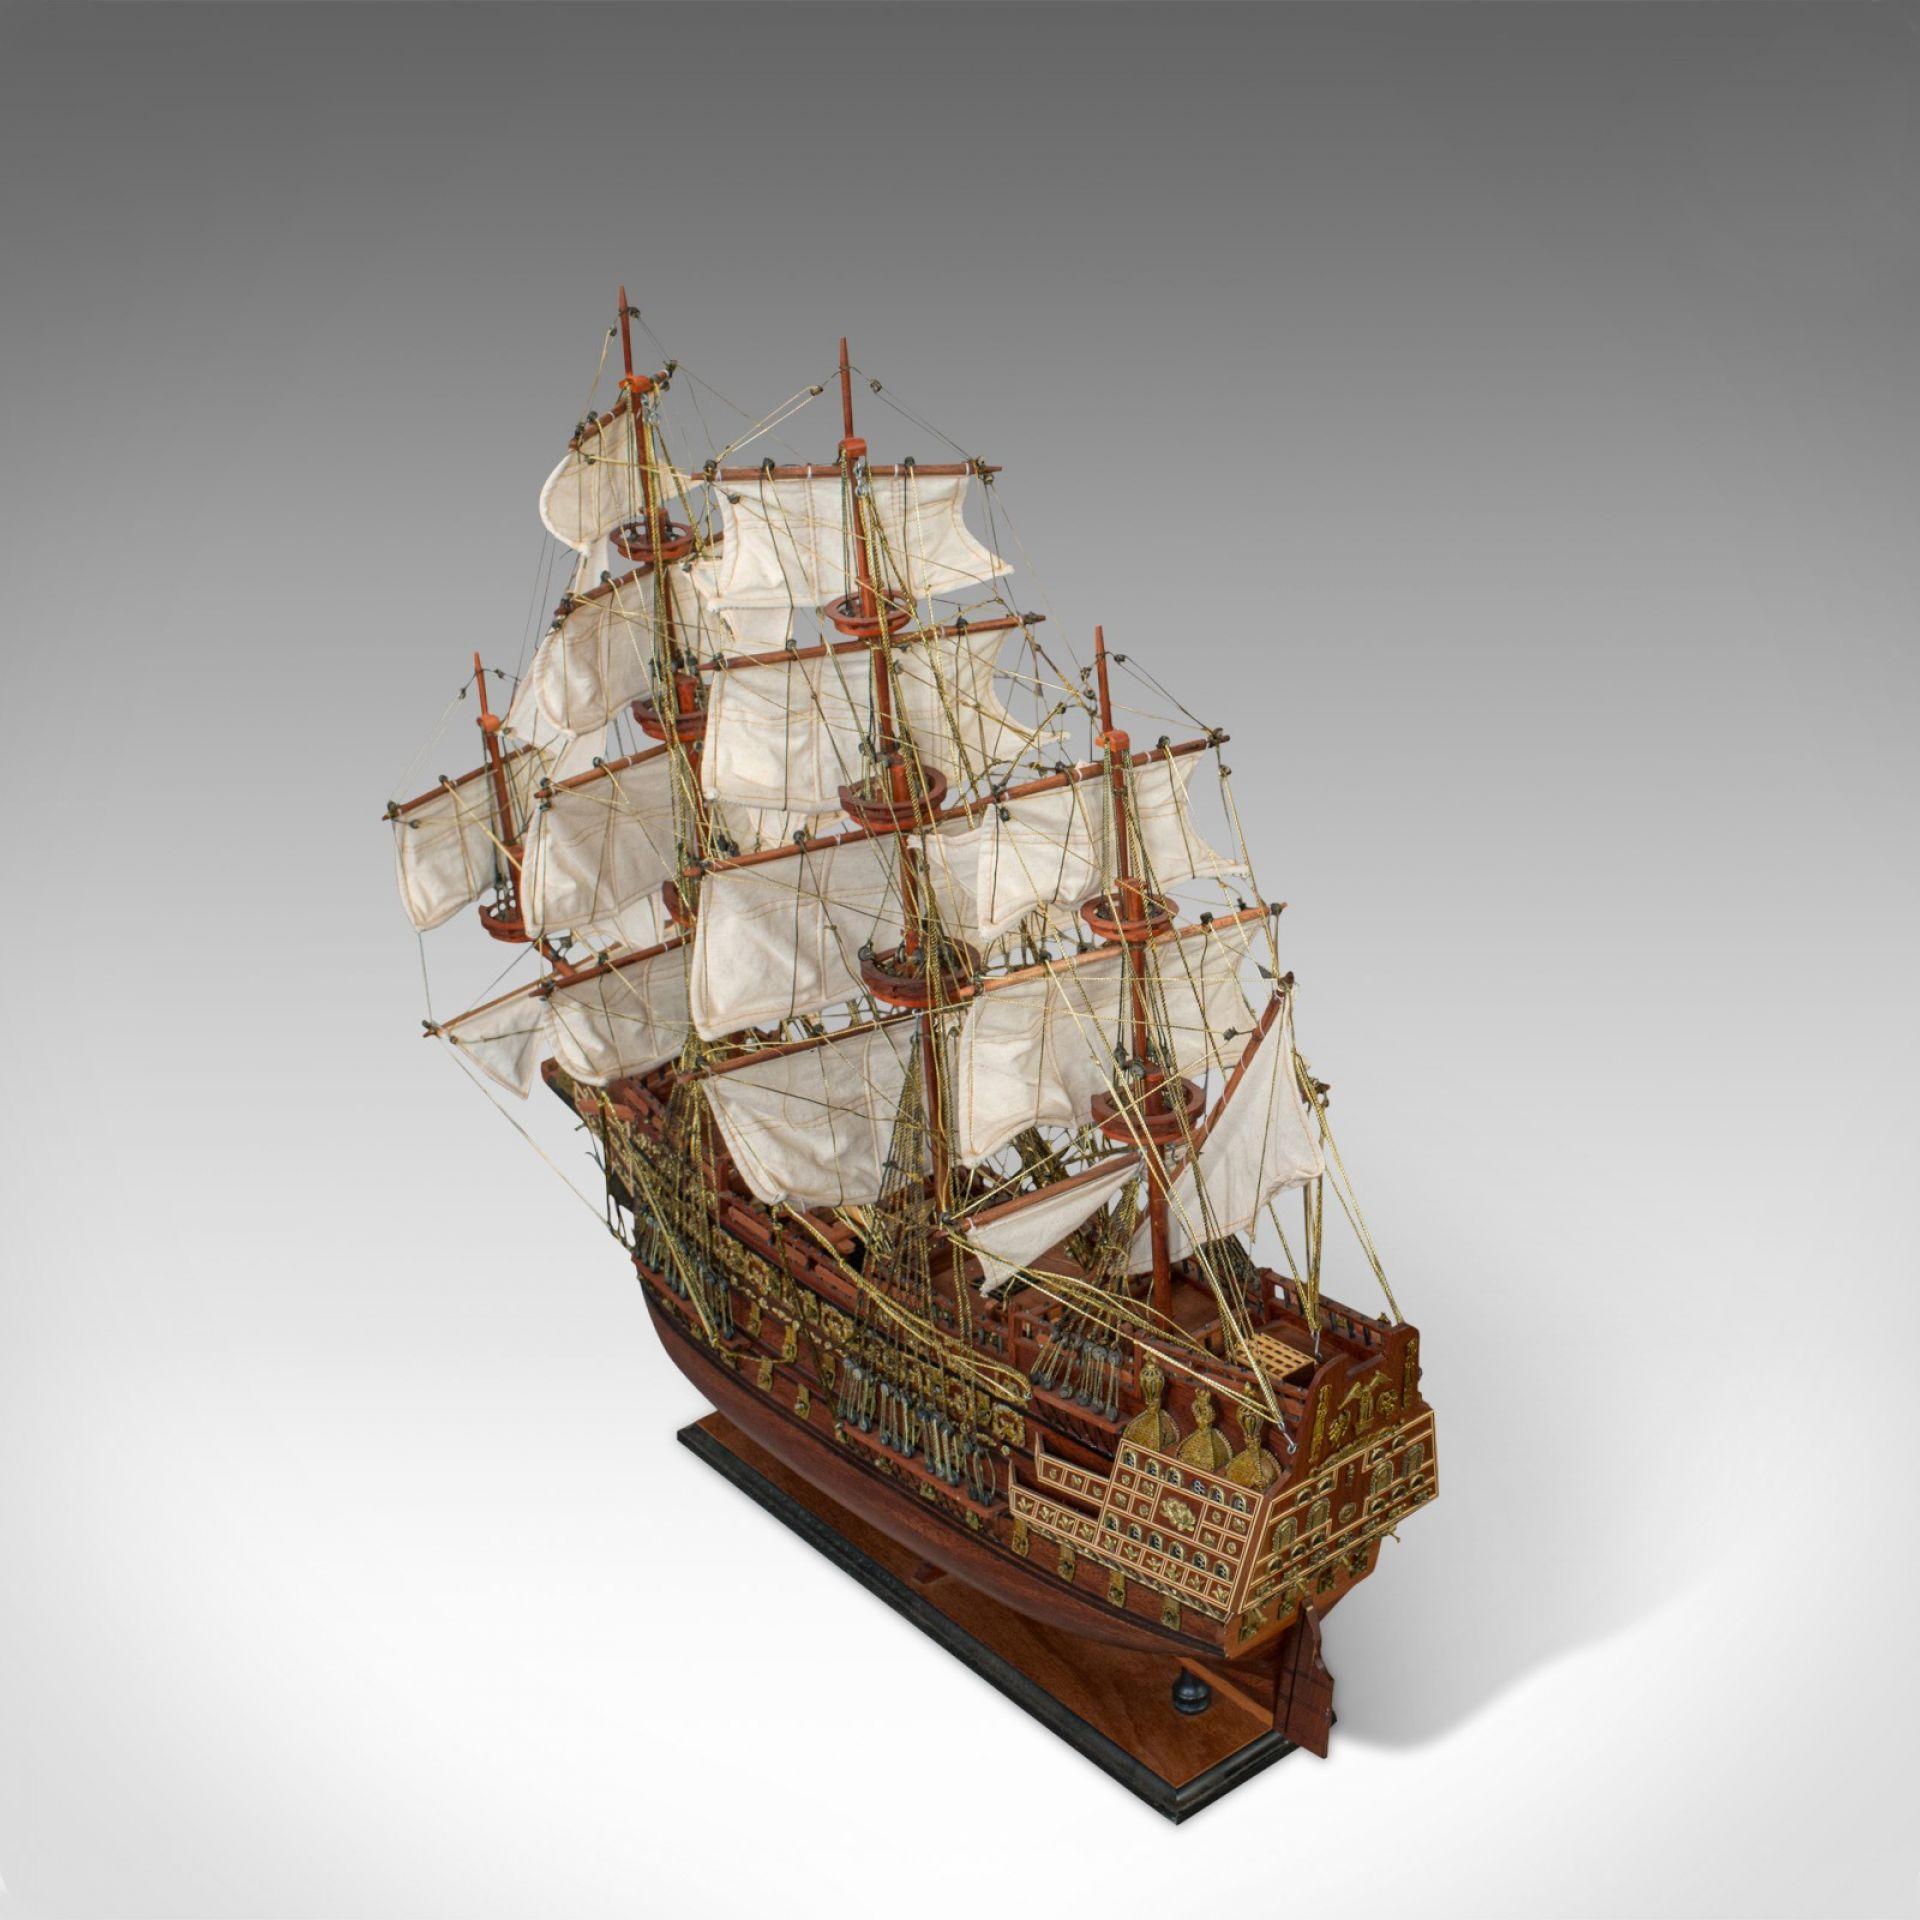 Large Vintage Model, Sovereign of the Seas, English, Mahogany, Collectible, Ship